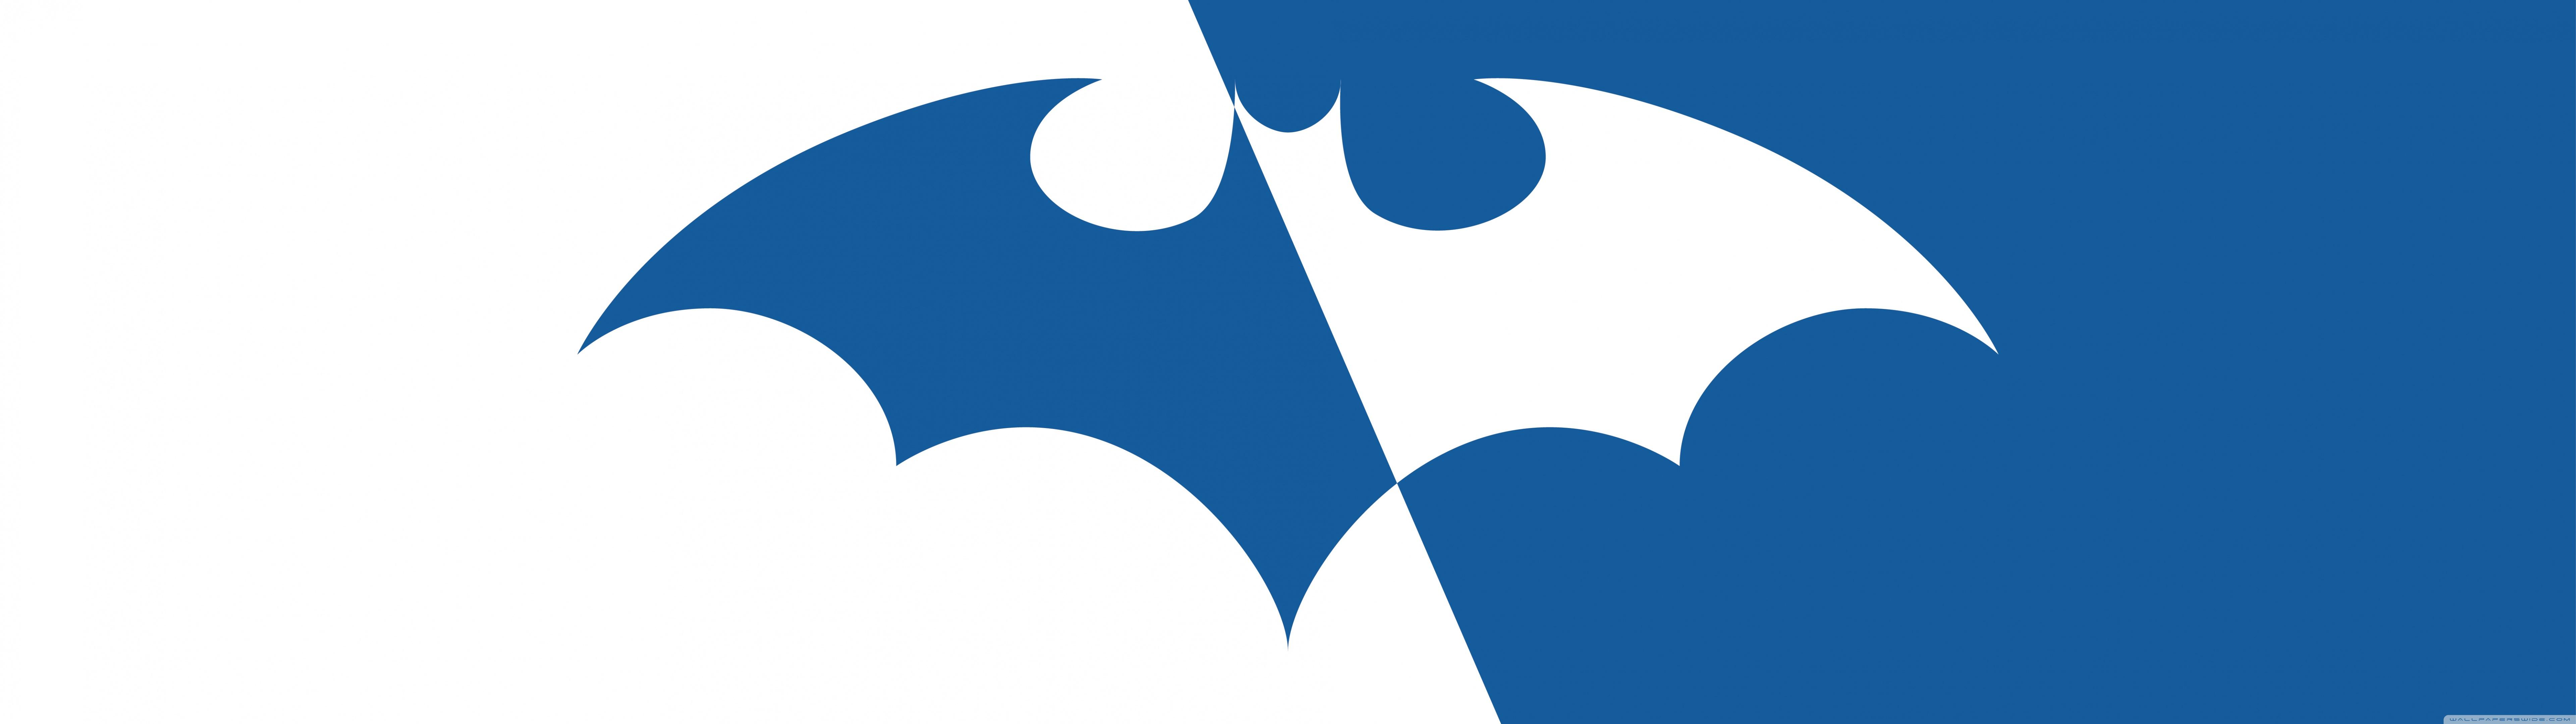 73 batman symbol hd wallpapers background images wallpaper batman batman logo batman symbol hd wallpaper background image id465730 buycottarizona